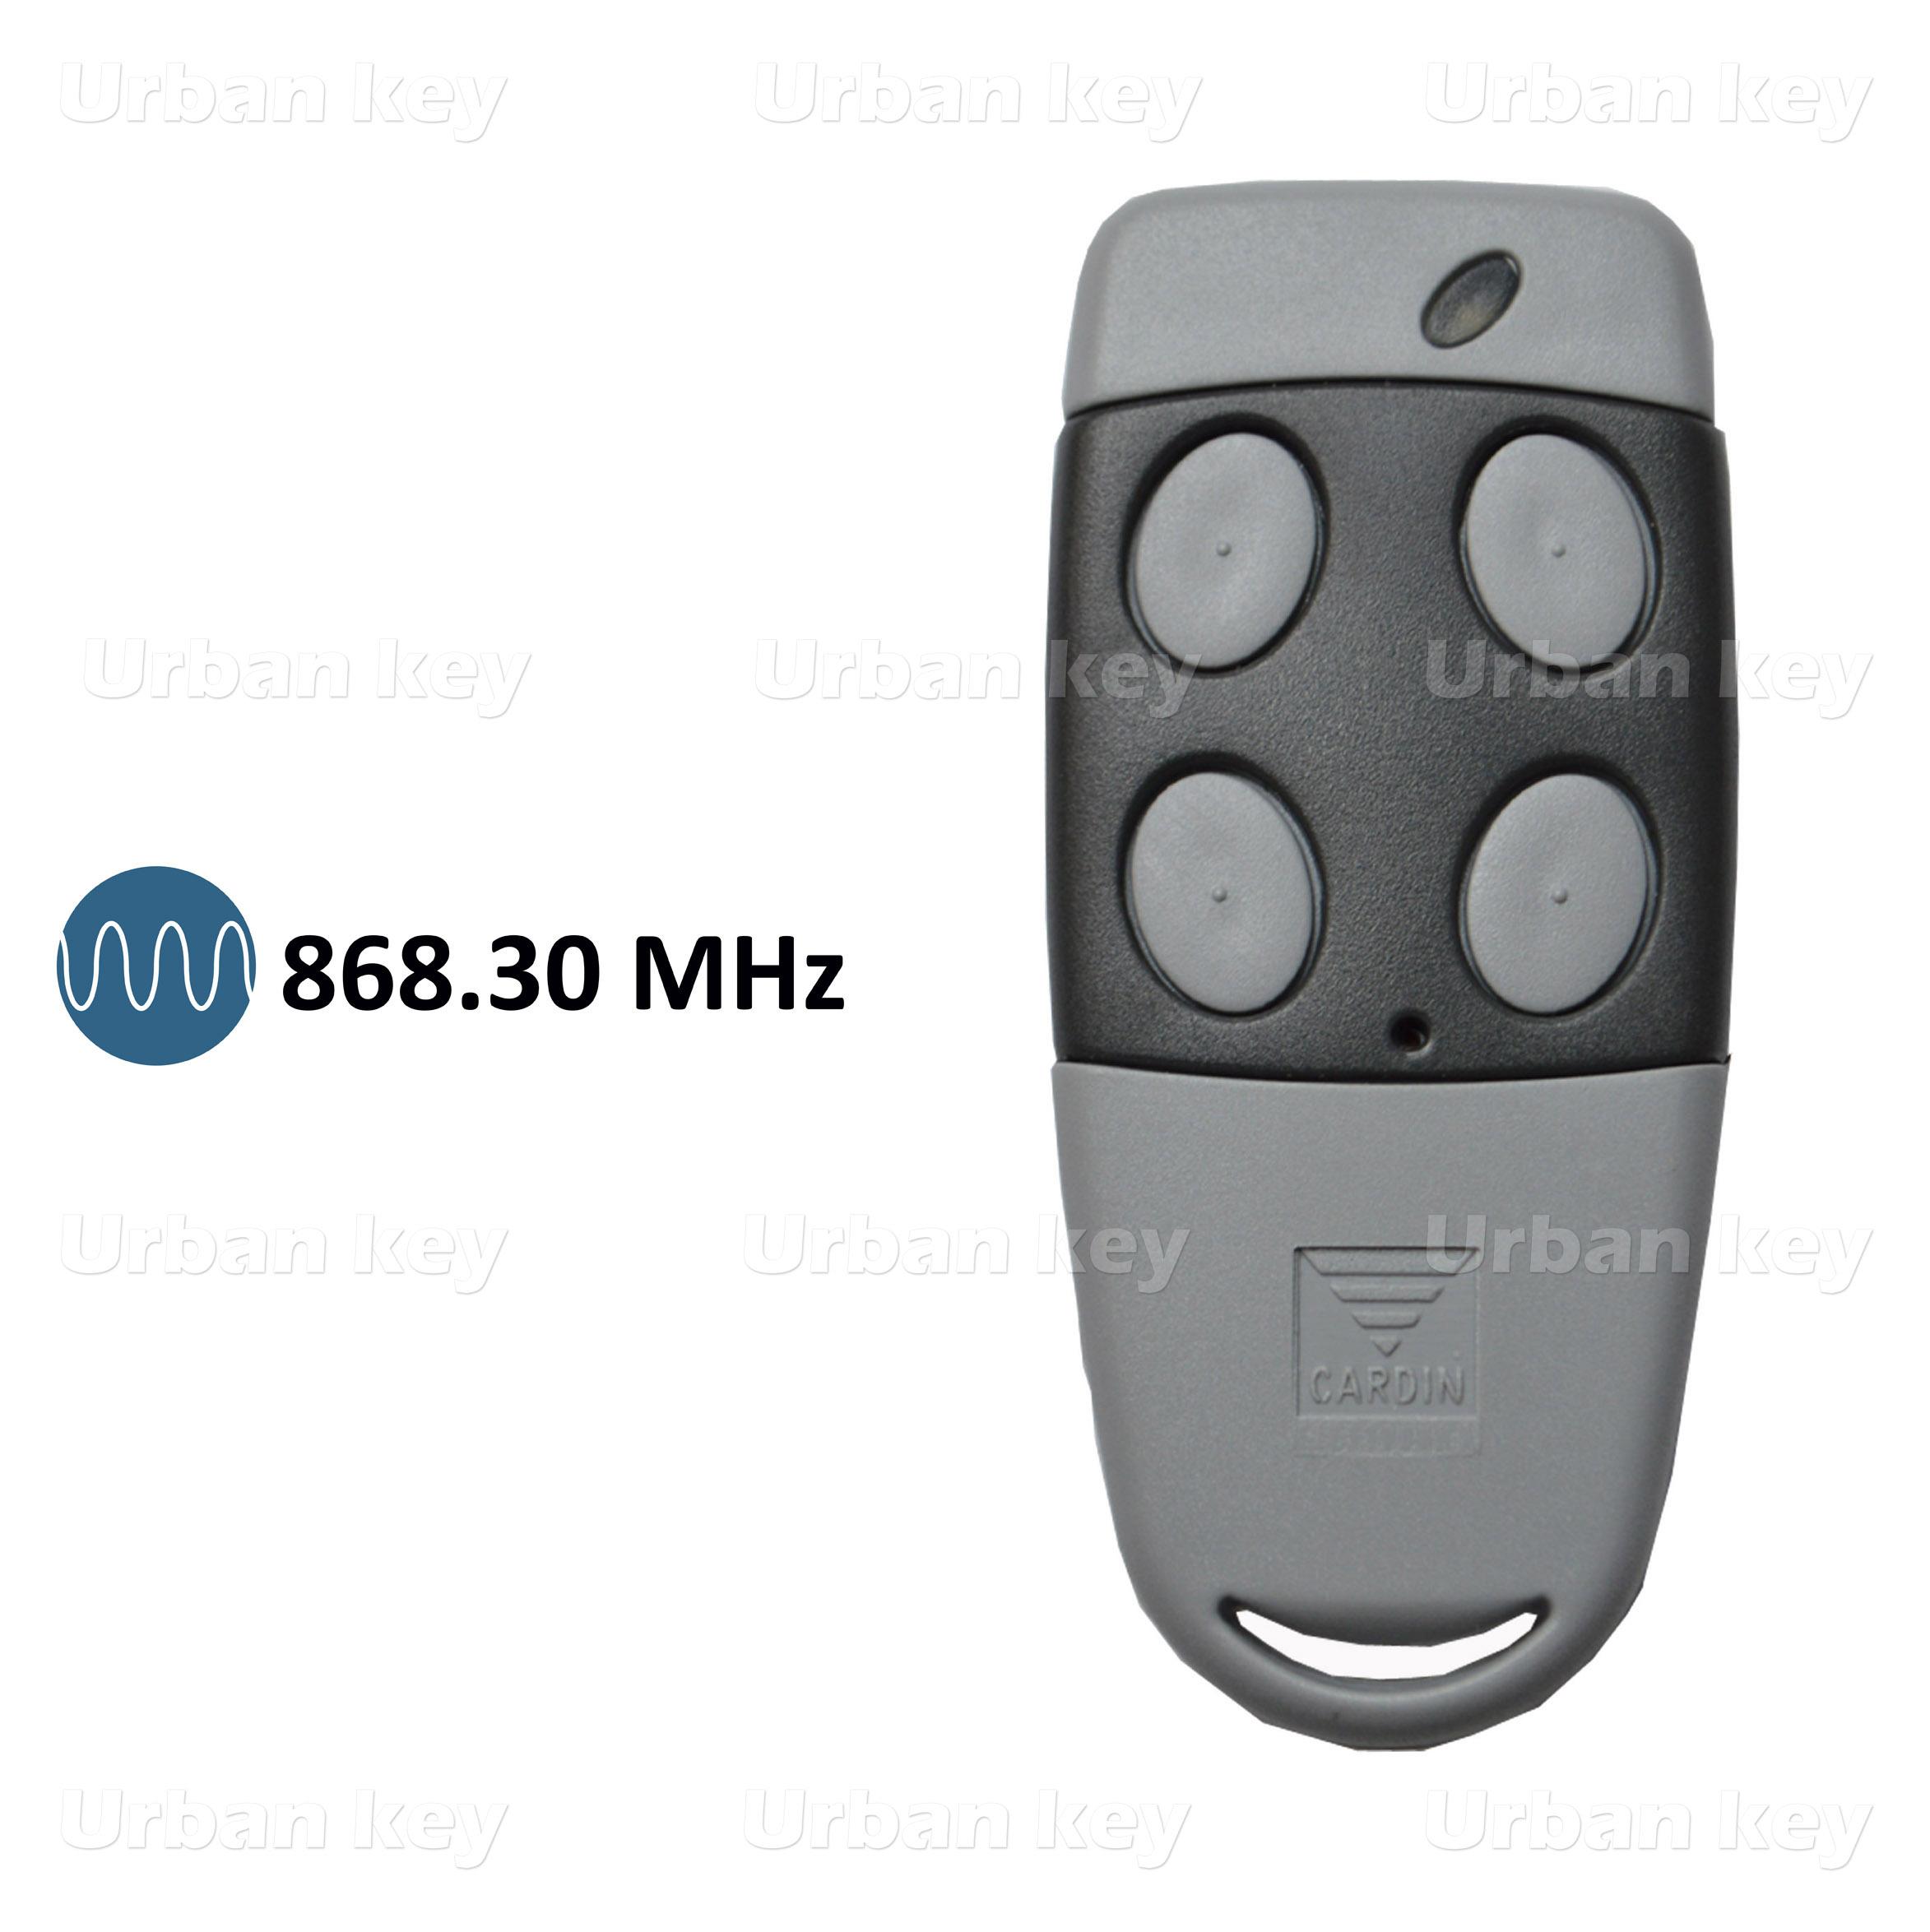 EMISSOR CARDIN S486 QZ/4  868MHZ 4 CANAIS